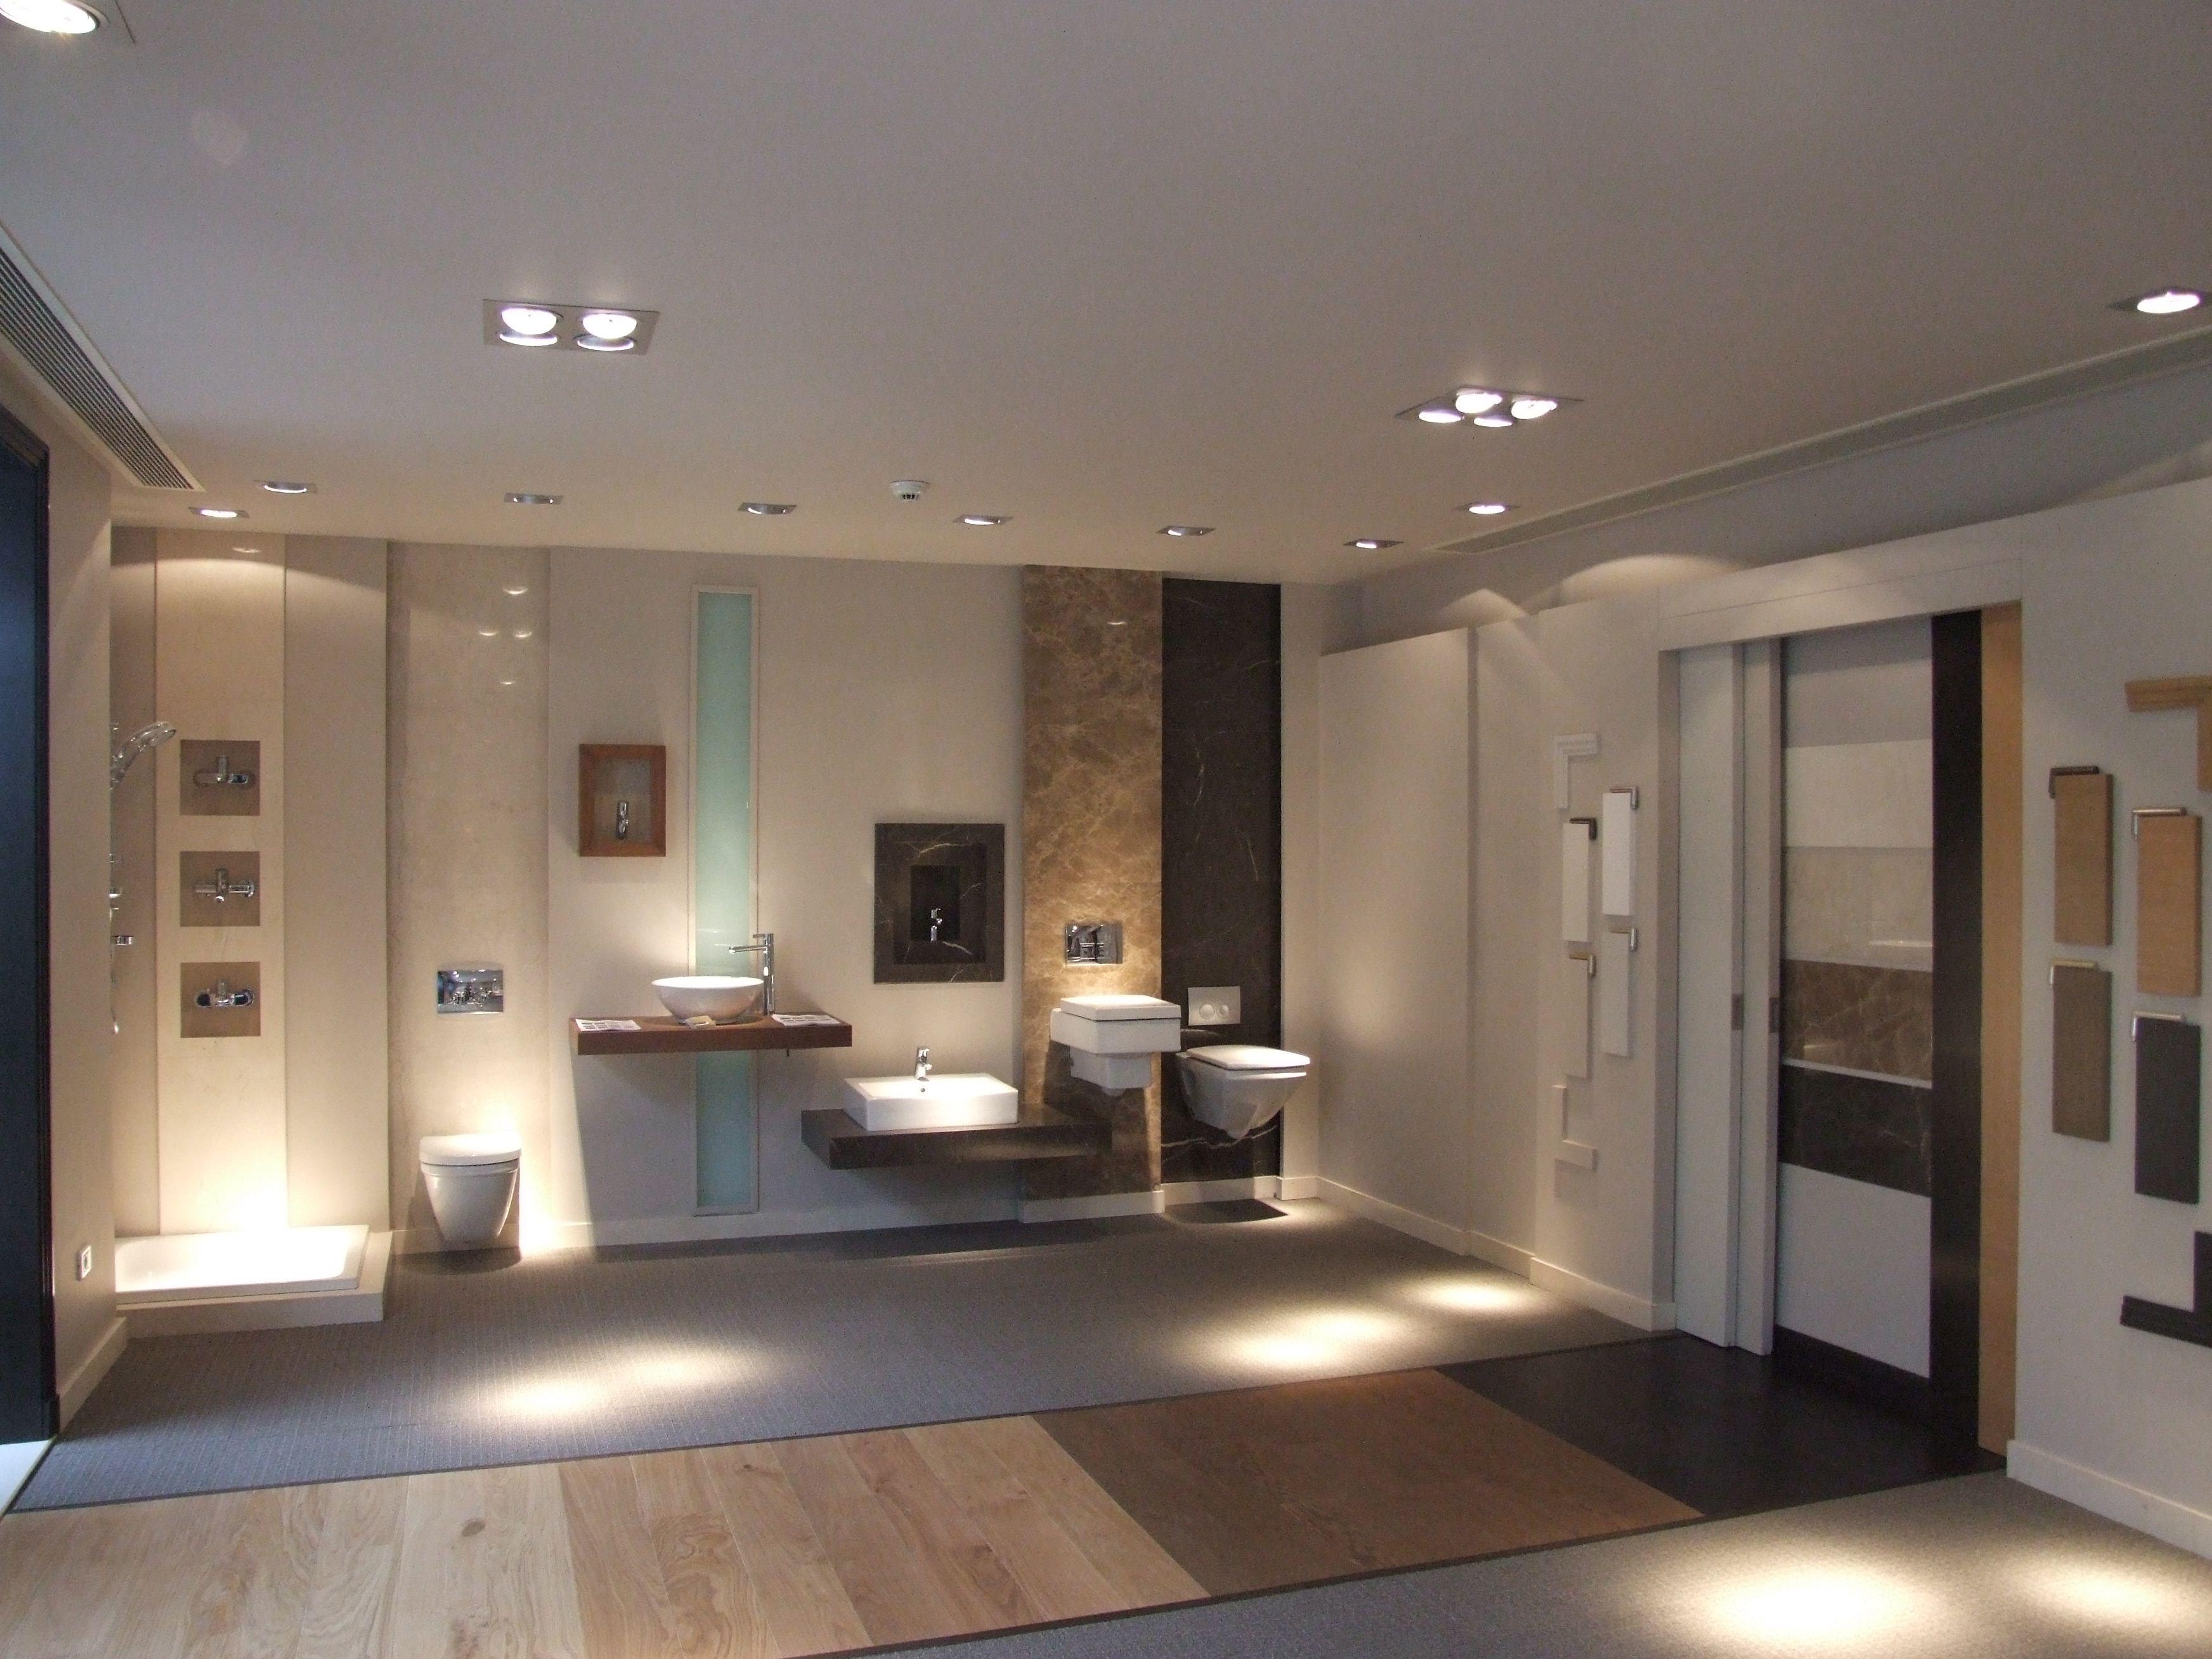 Finishing Matrix Room By Mona Hussein Design House | Finishing ...